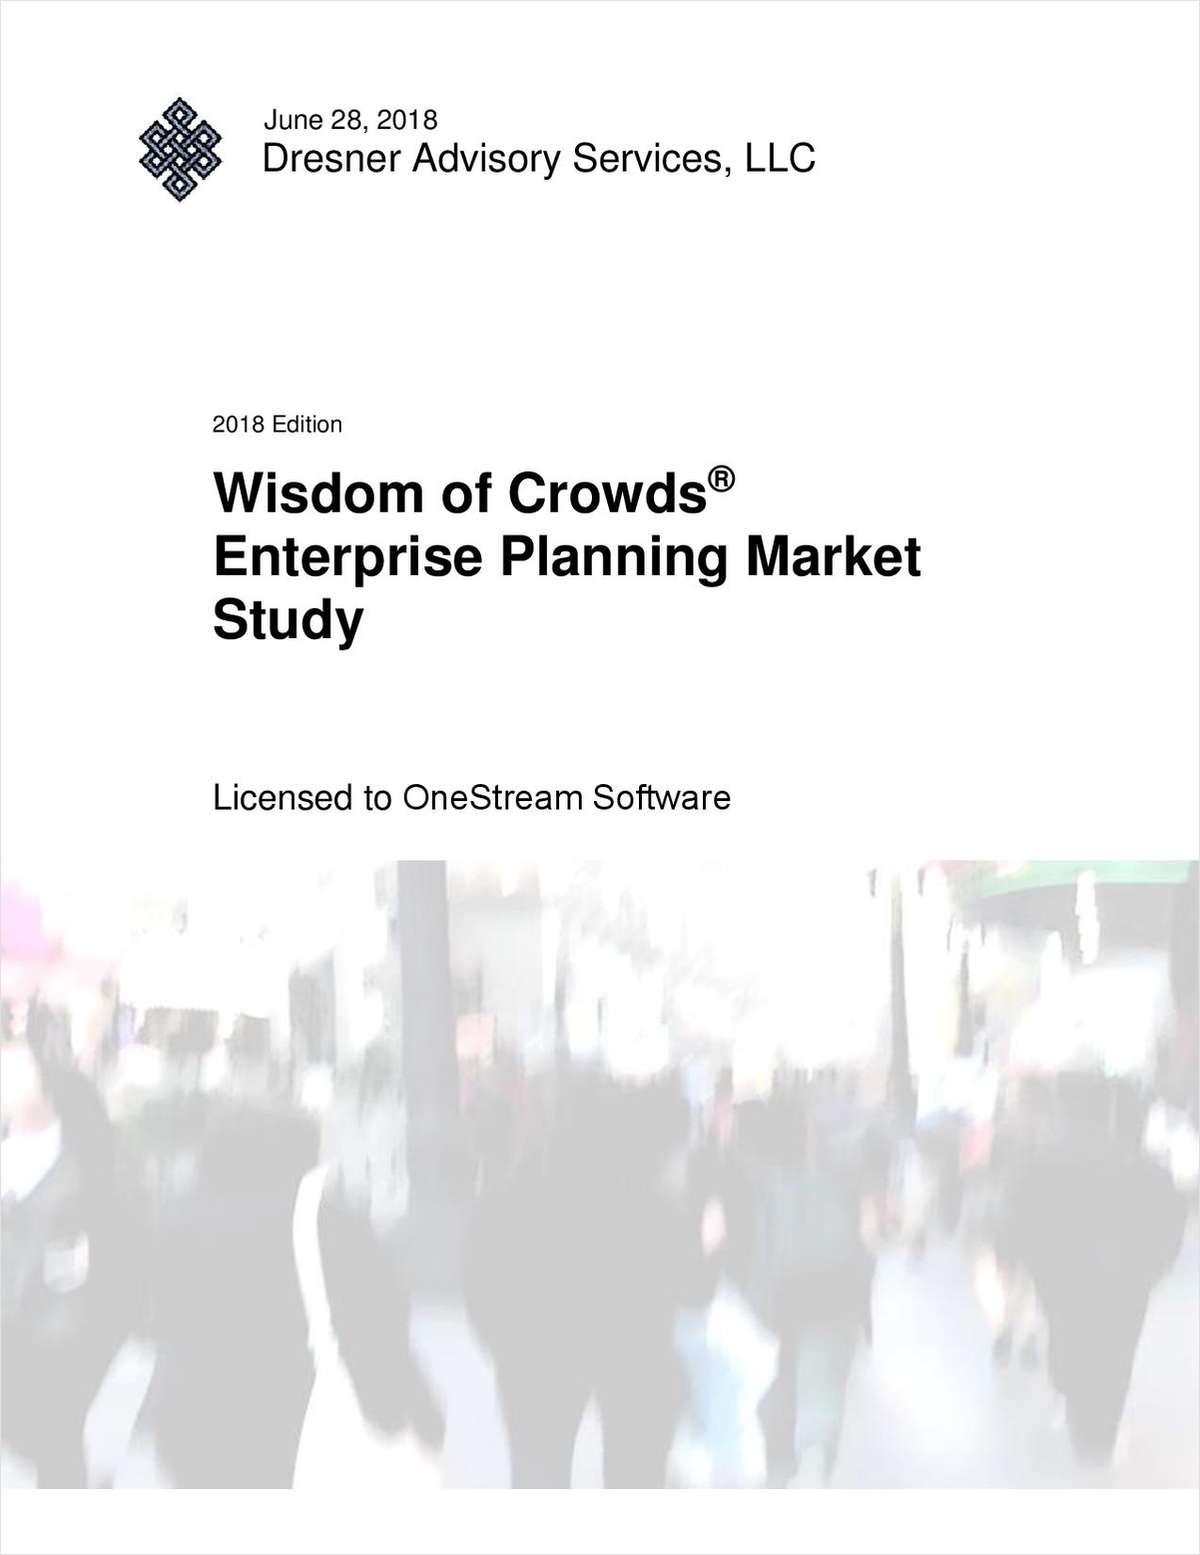 Dresner Advisory Wisdom of Crowds® Enterprise Planning Market Study